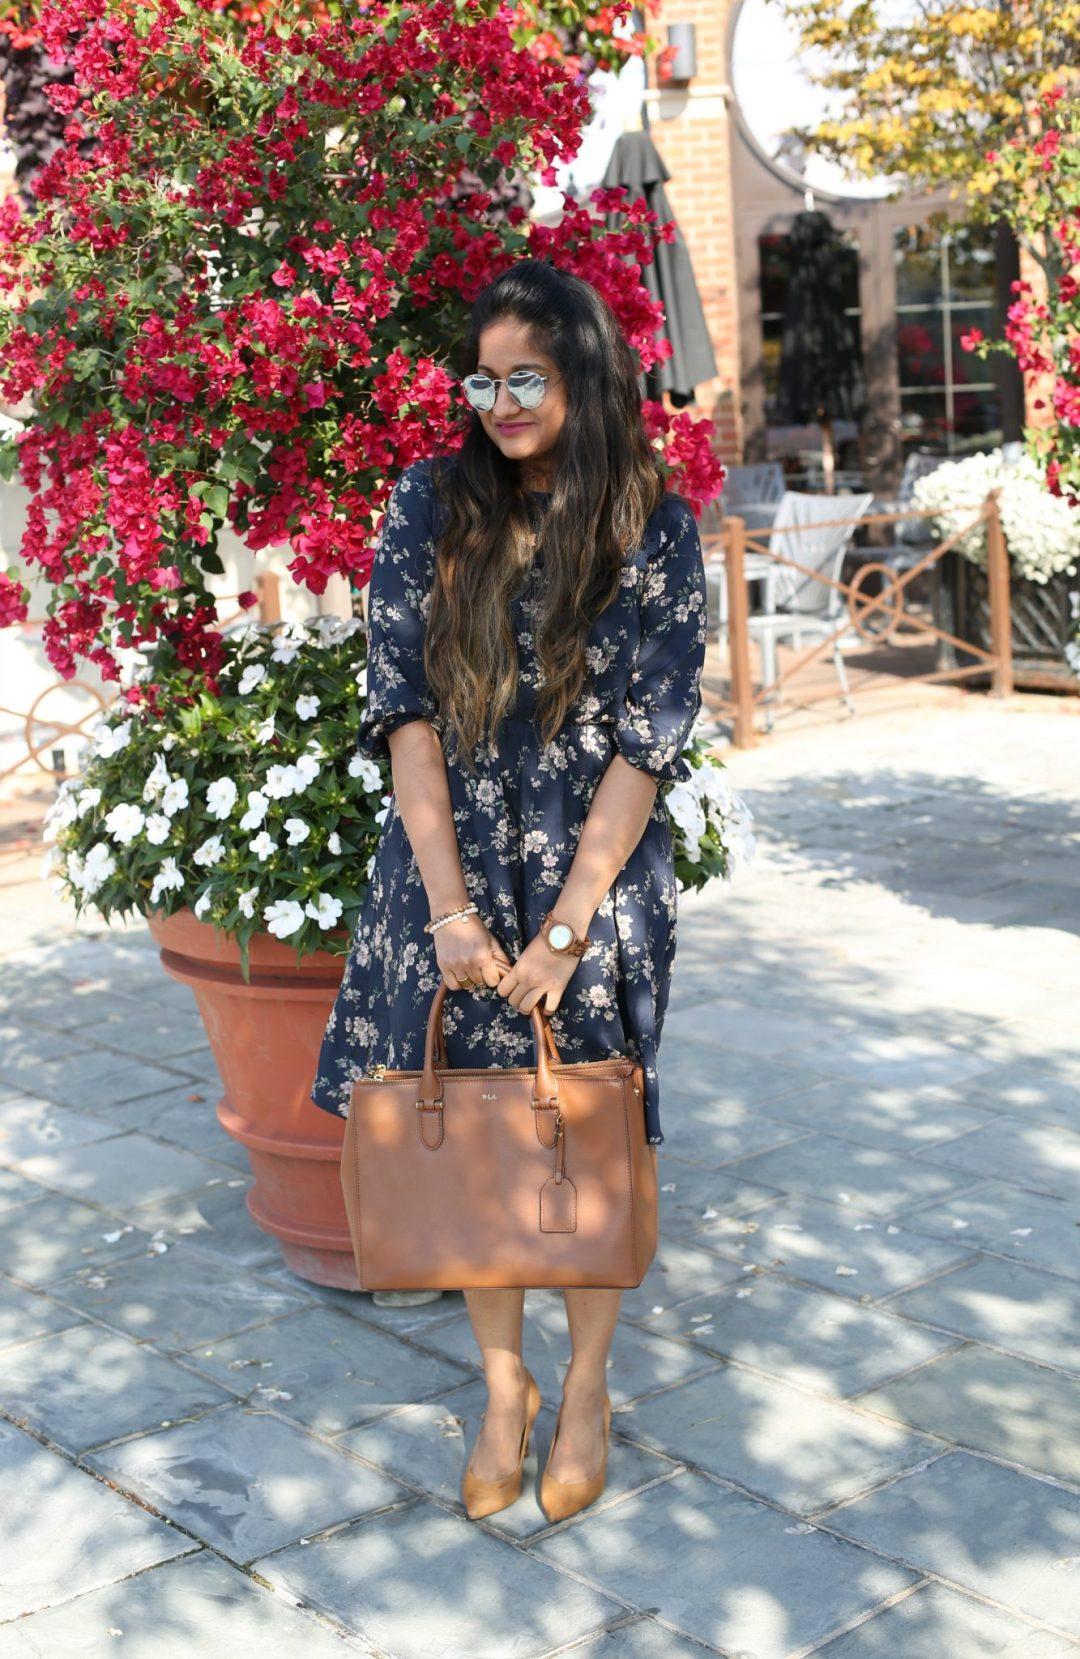 modcloth-areve-floral-dress-1